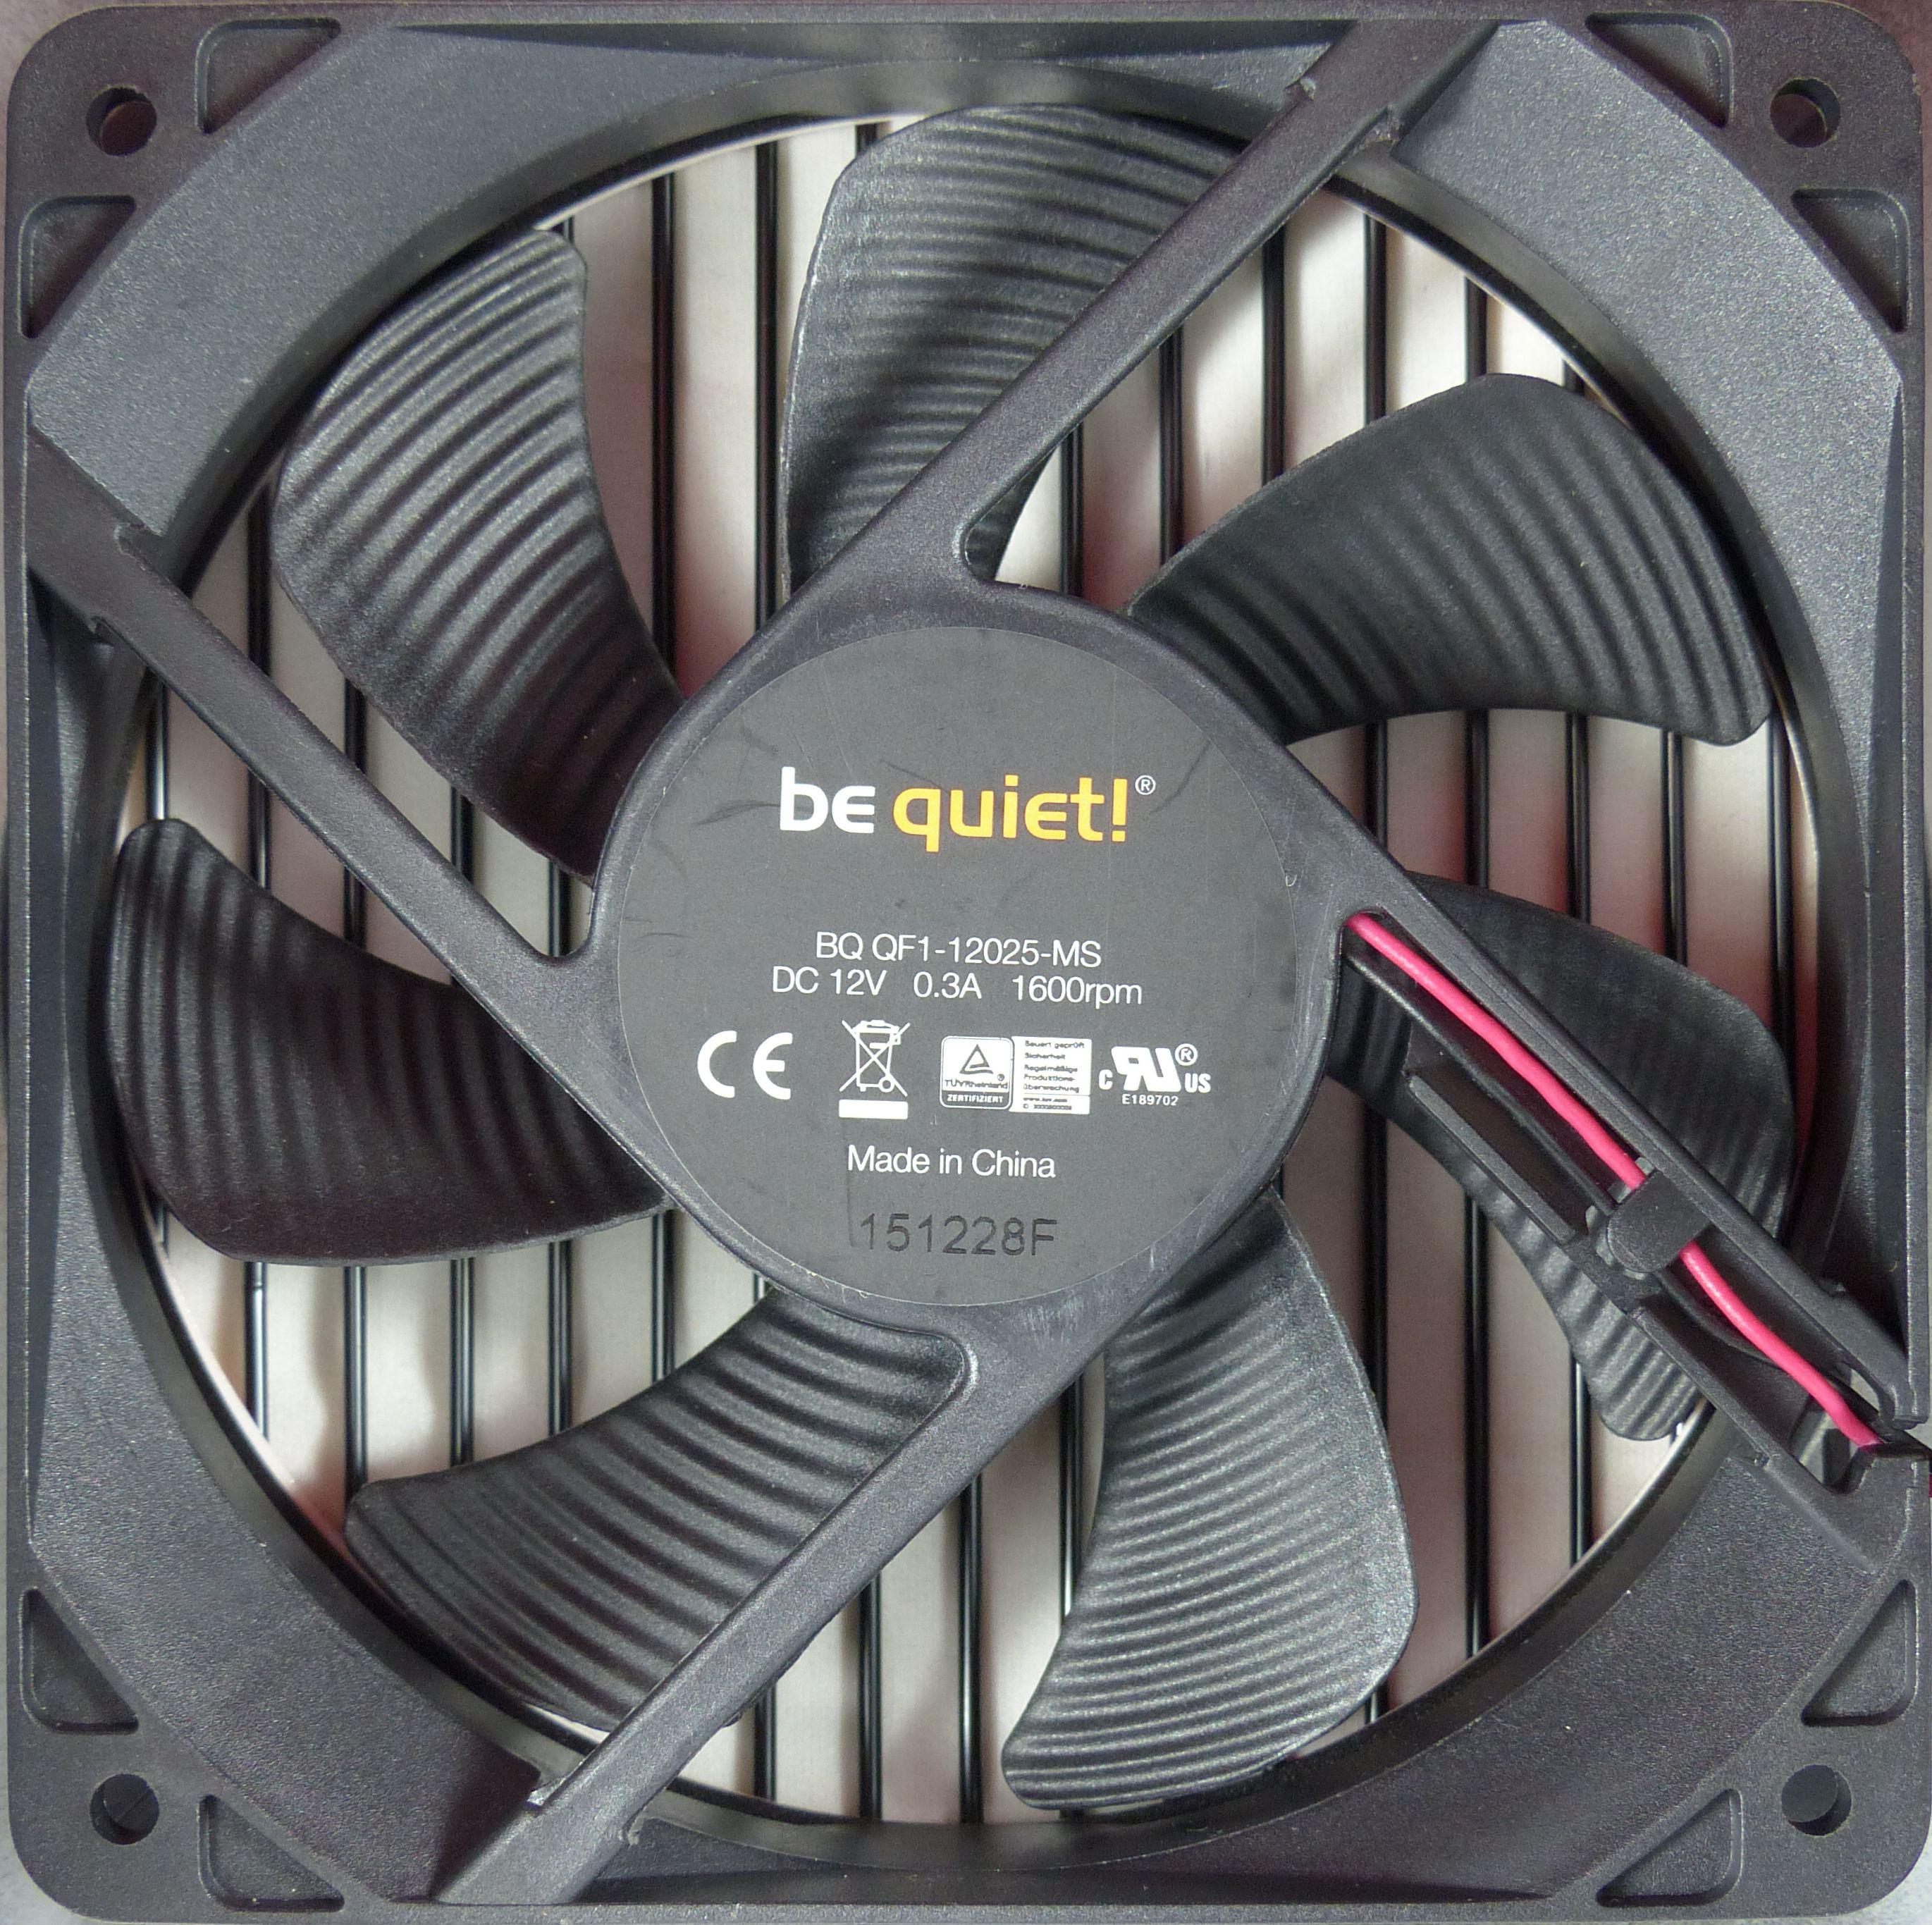 Vw 1600 Max Rpm: Be Quiet! Pure Power 9 500 CM